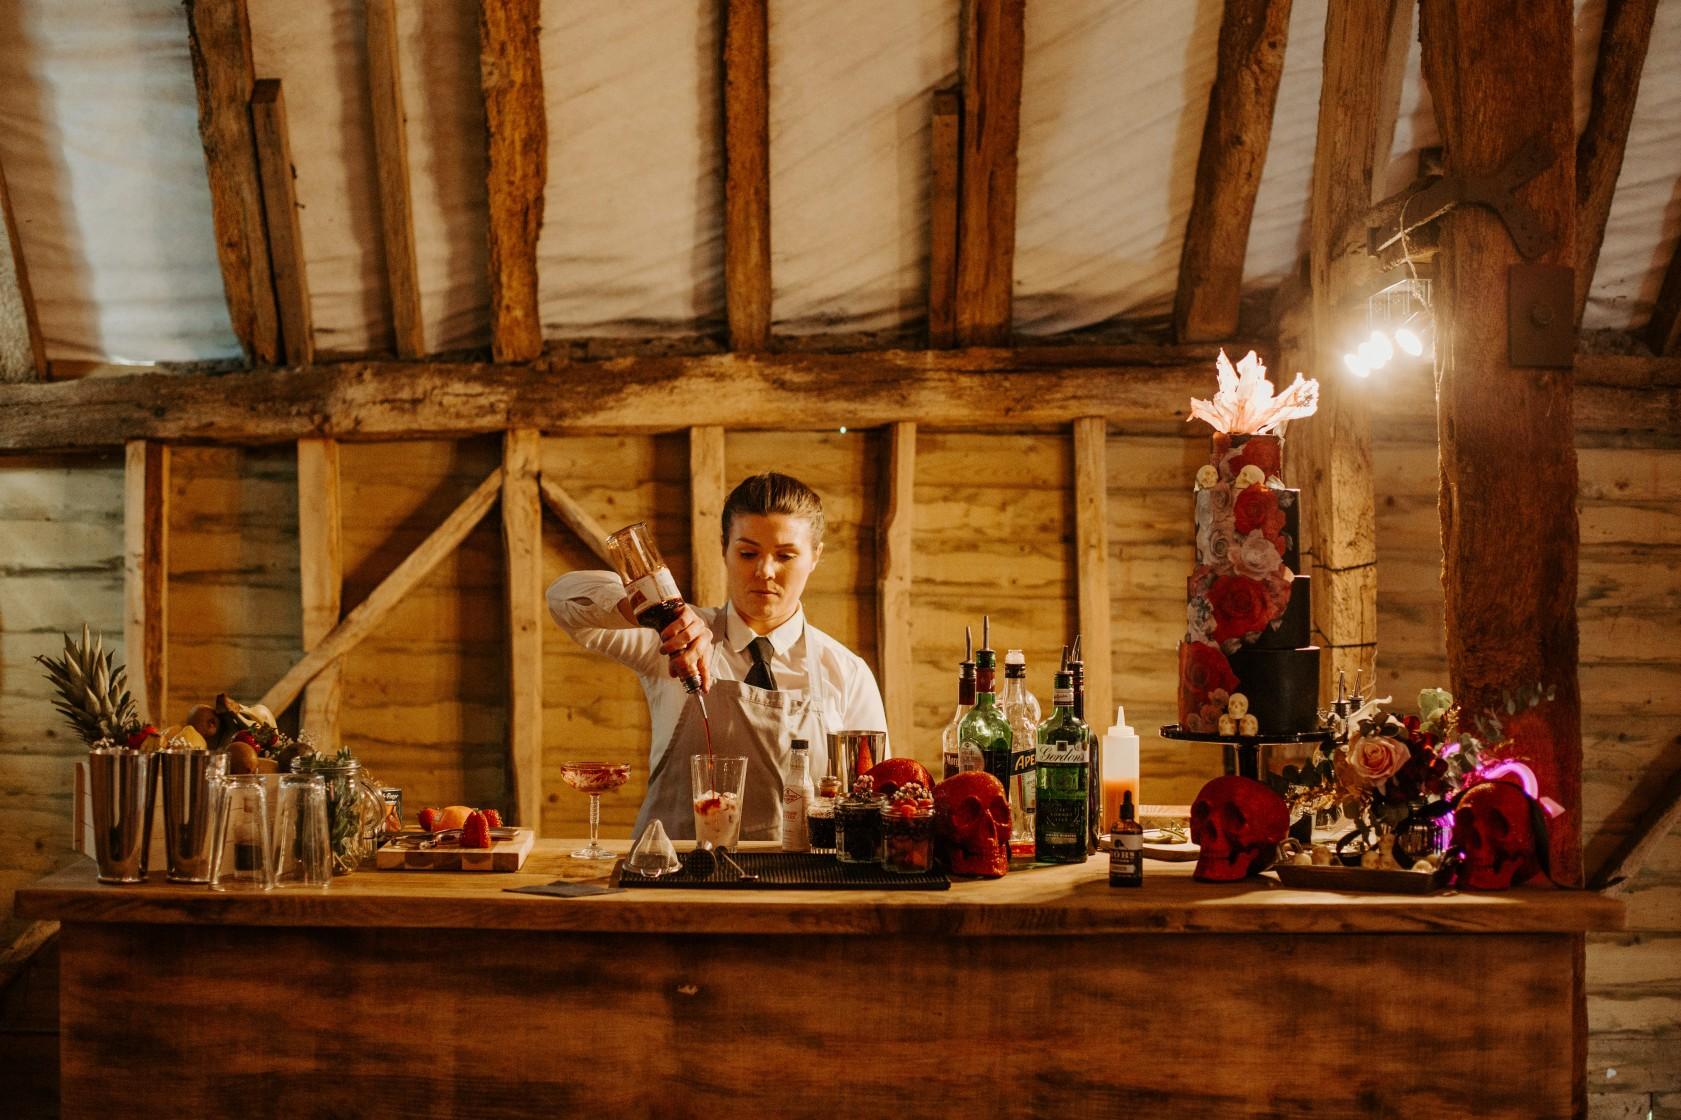 wedding cocktail bar - bespoke wedding cocktails - rock and roll wedding